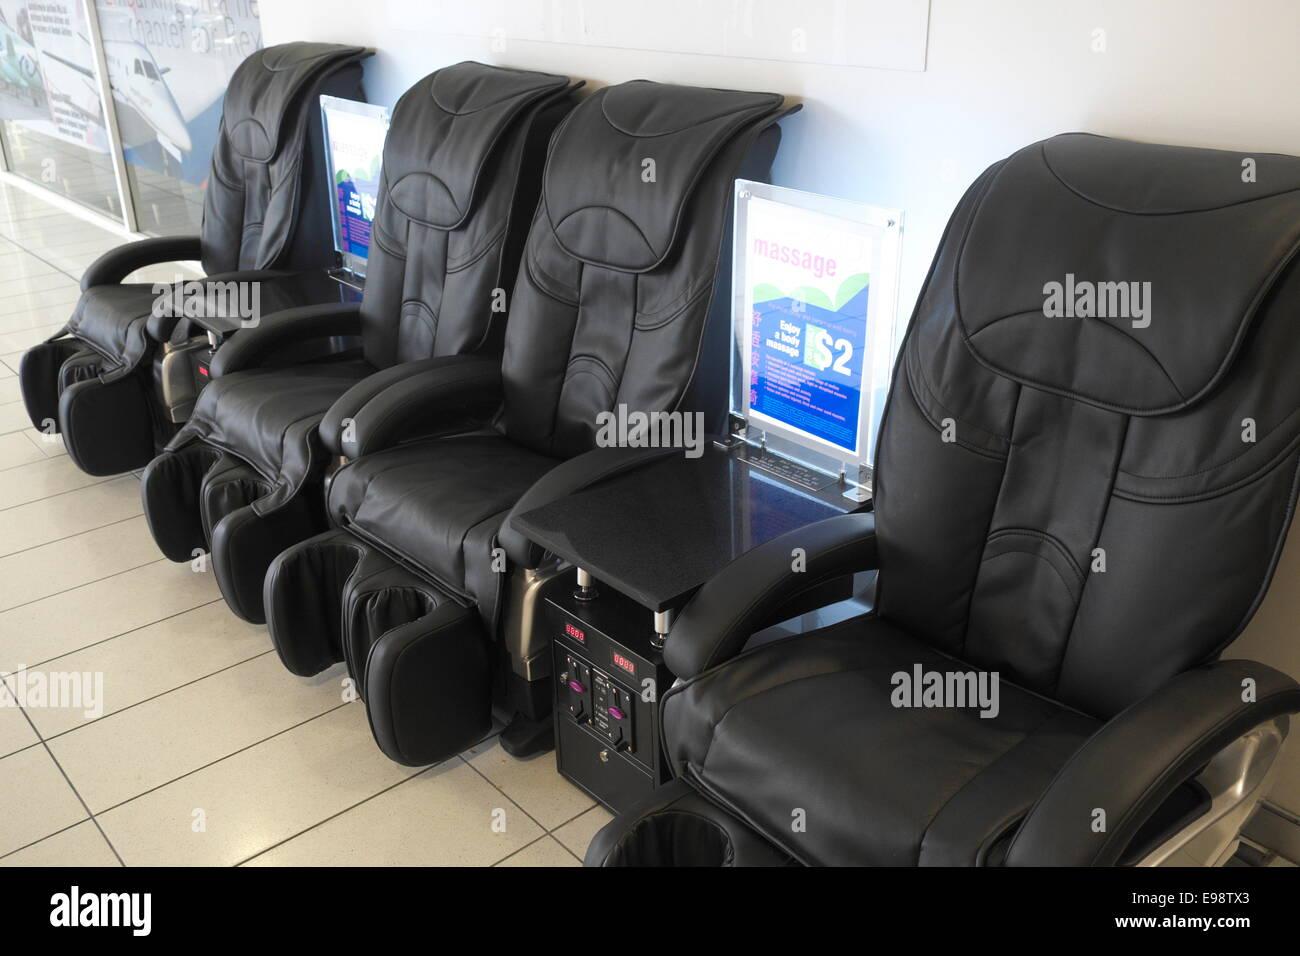 backache massage chairs at sydney airport australia stock photo